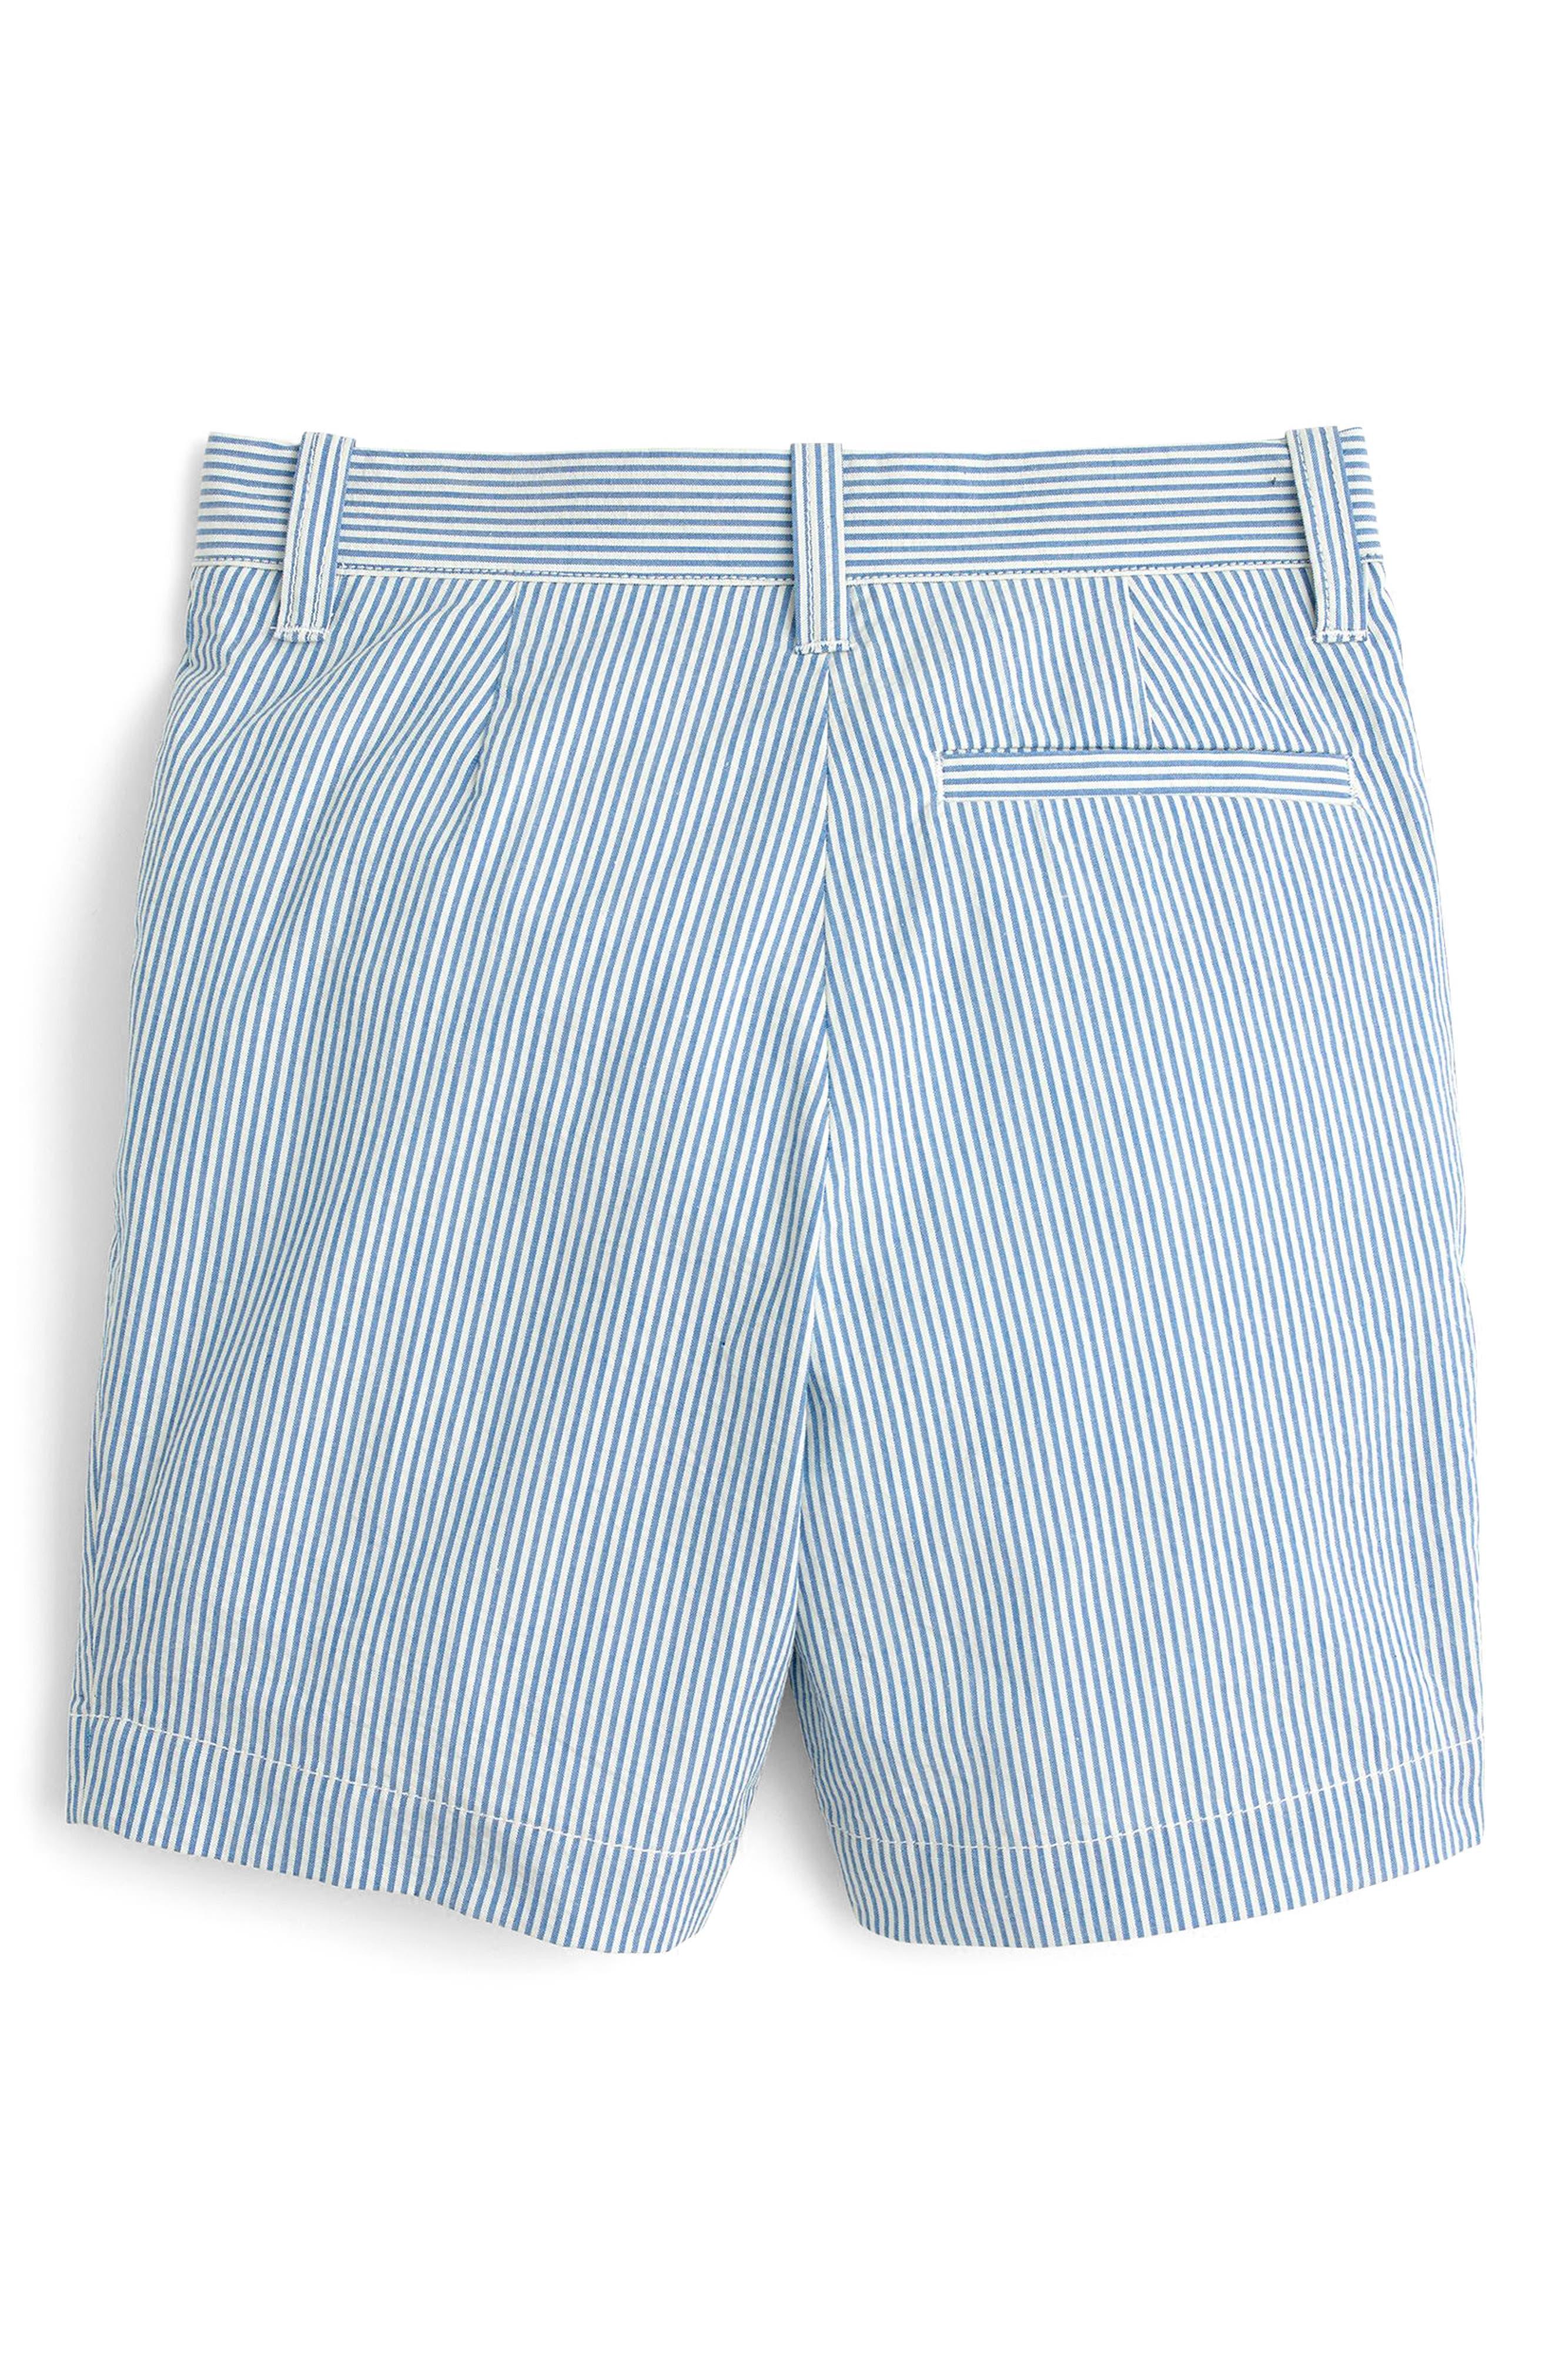 Seersucker Shorts,                             Alternate thumbnail 2, color,